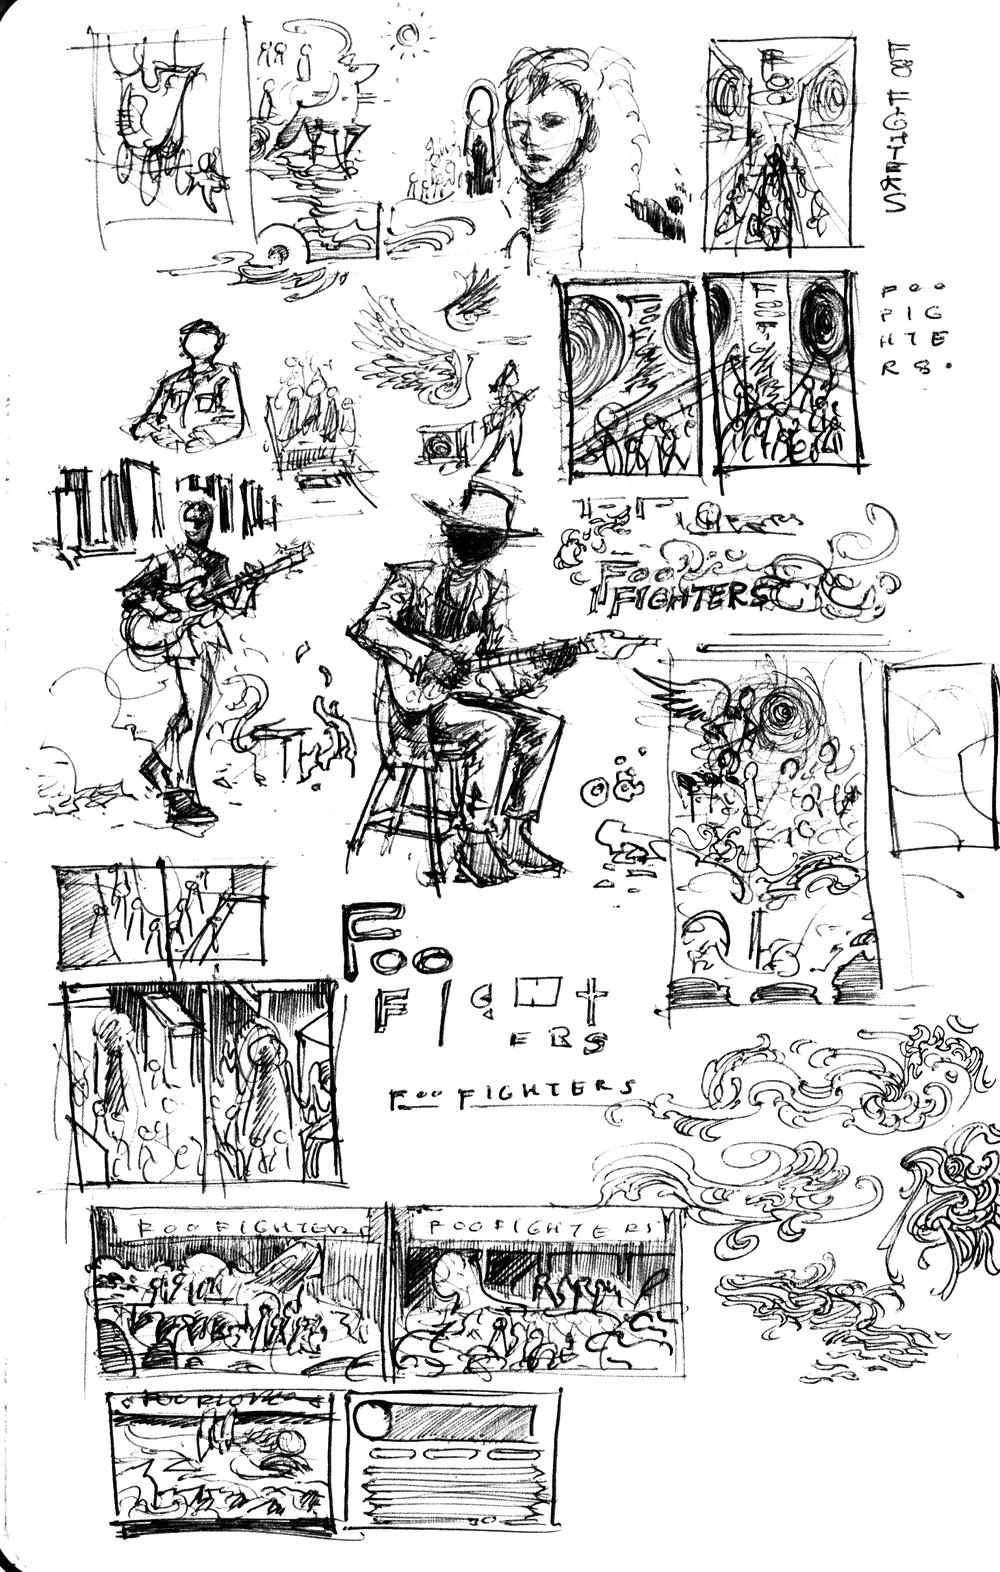 thumbnails 1.png